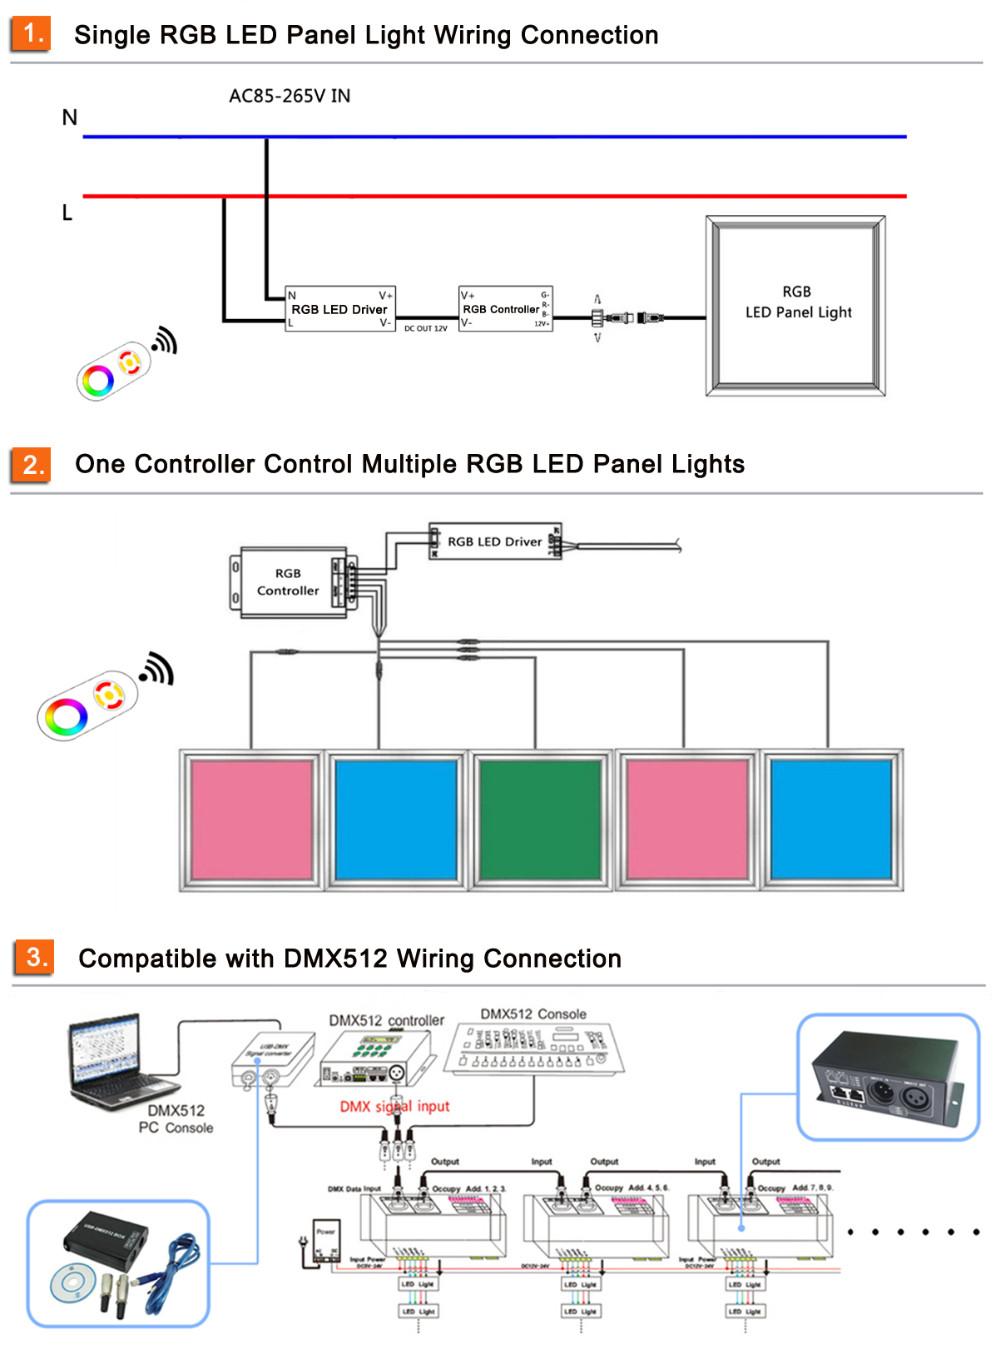 dmx512 system compatible 50000 hours lifespan 36w 600x600. Black Bedroom Furniture Sets. Home Design Ideas